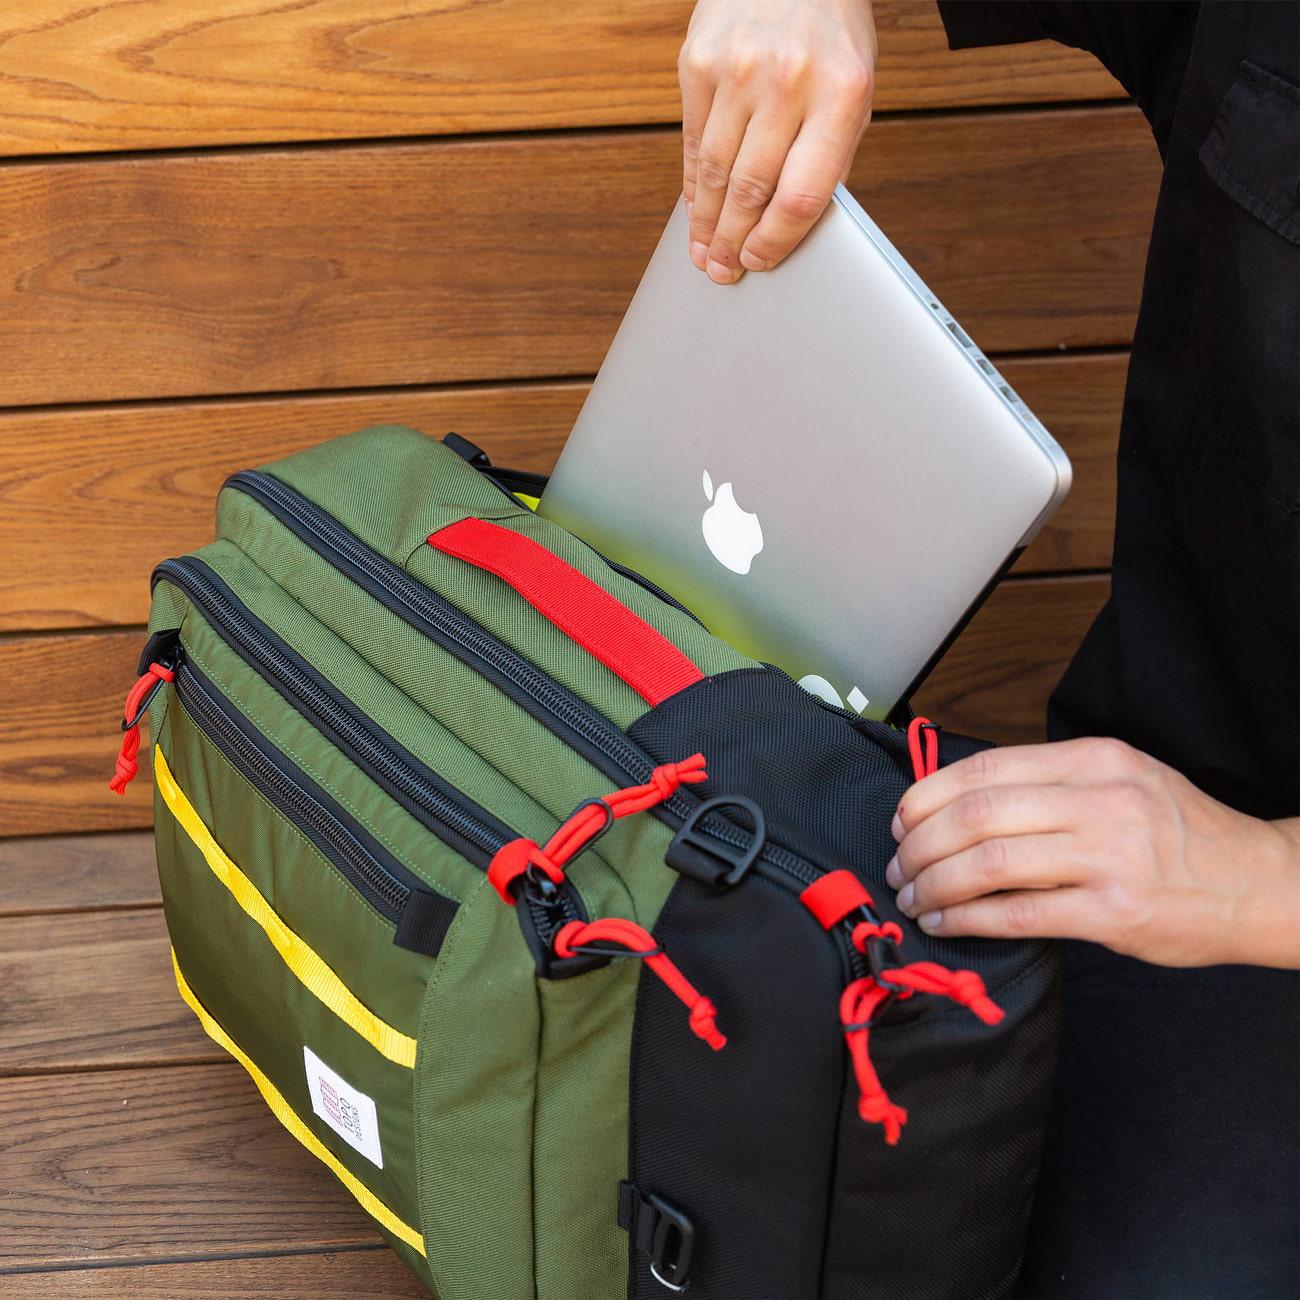 Best Travel Backpack for Organization